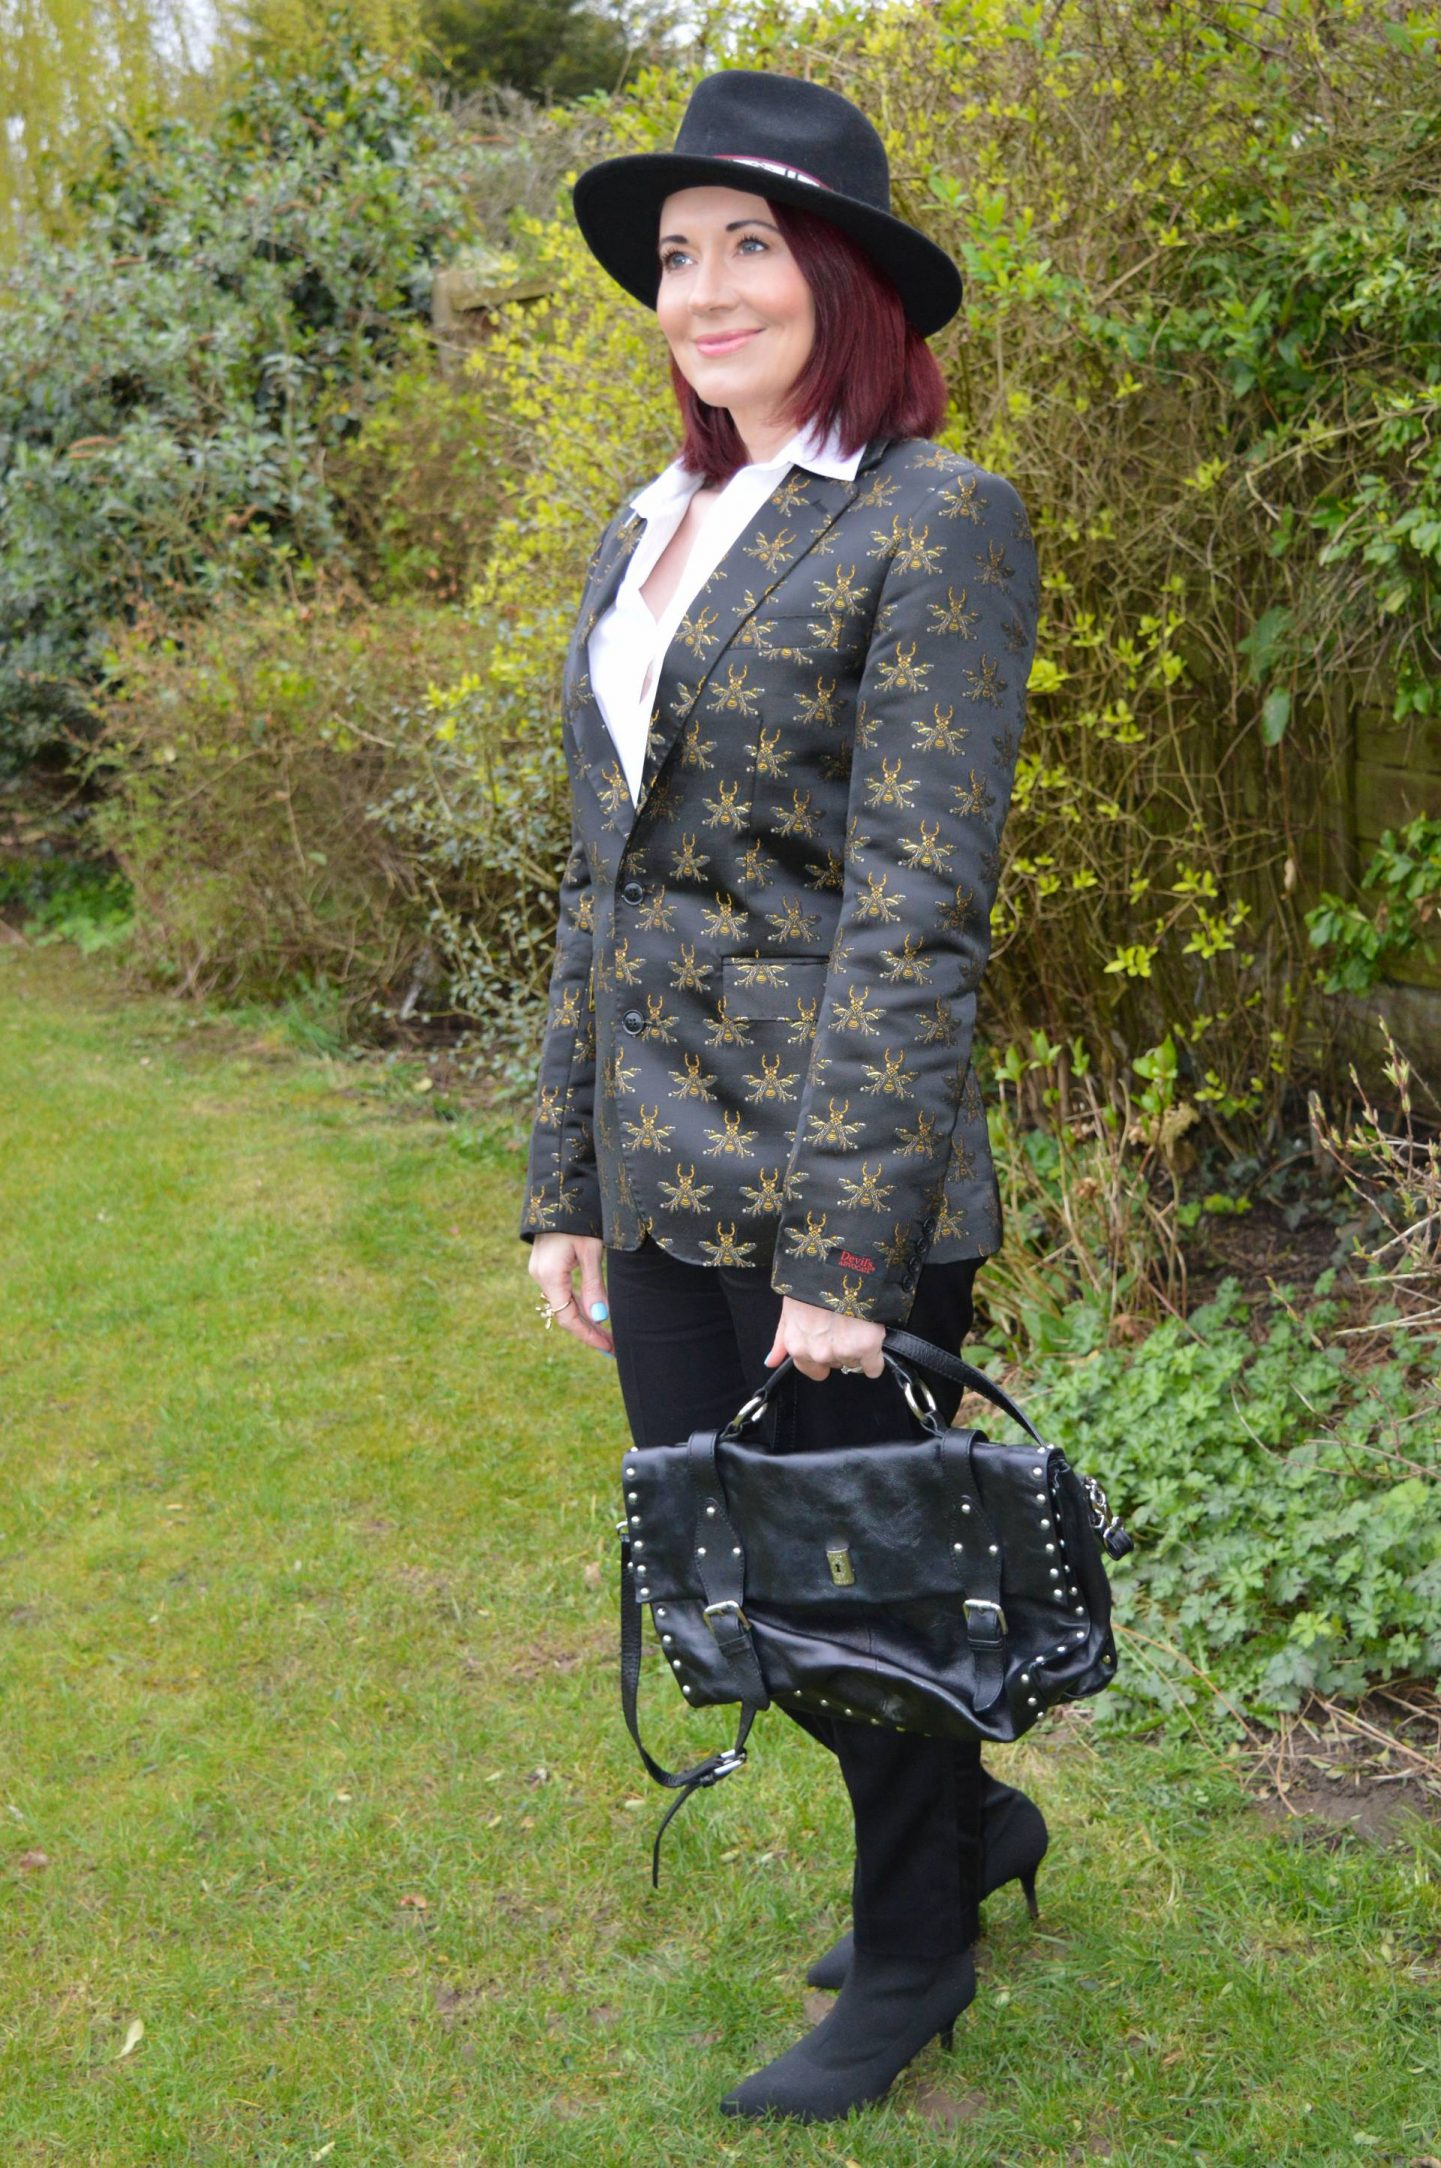 Borrowed From the Boy, Devil's Advocate bee embroidered blazer, Tibi tuxedo trousers, Zara black fedora, Modalu black studded satchel